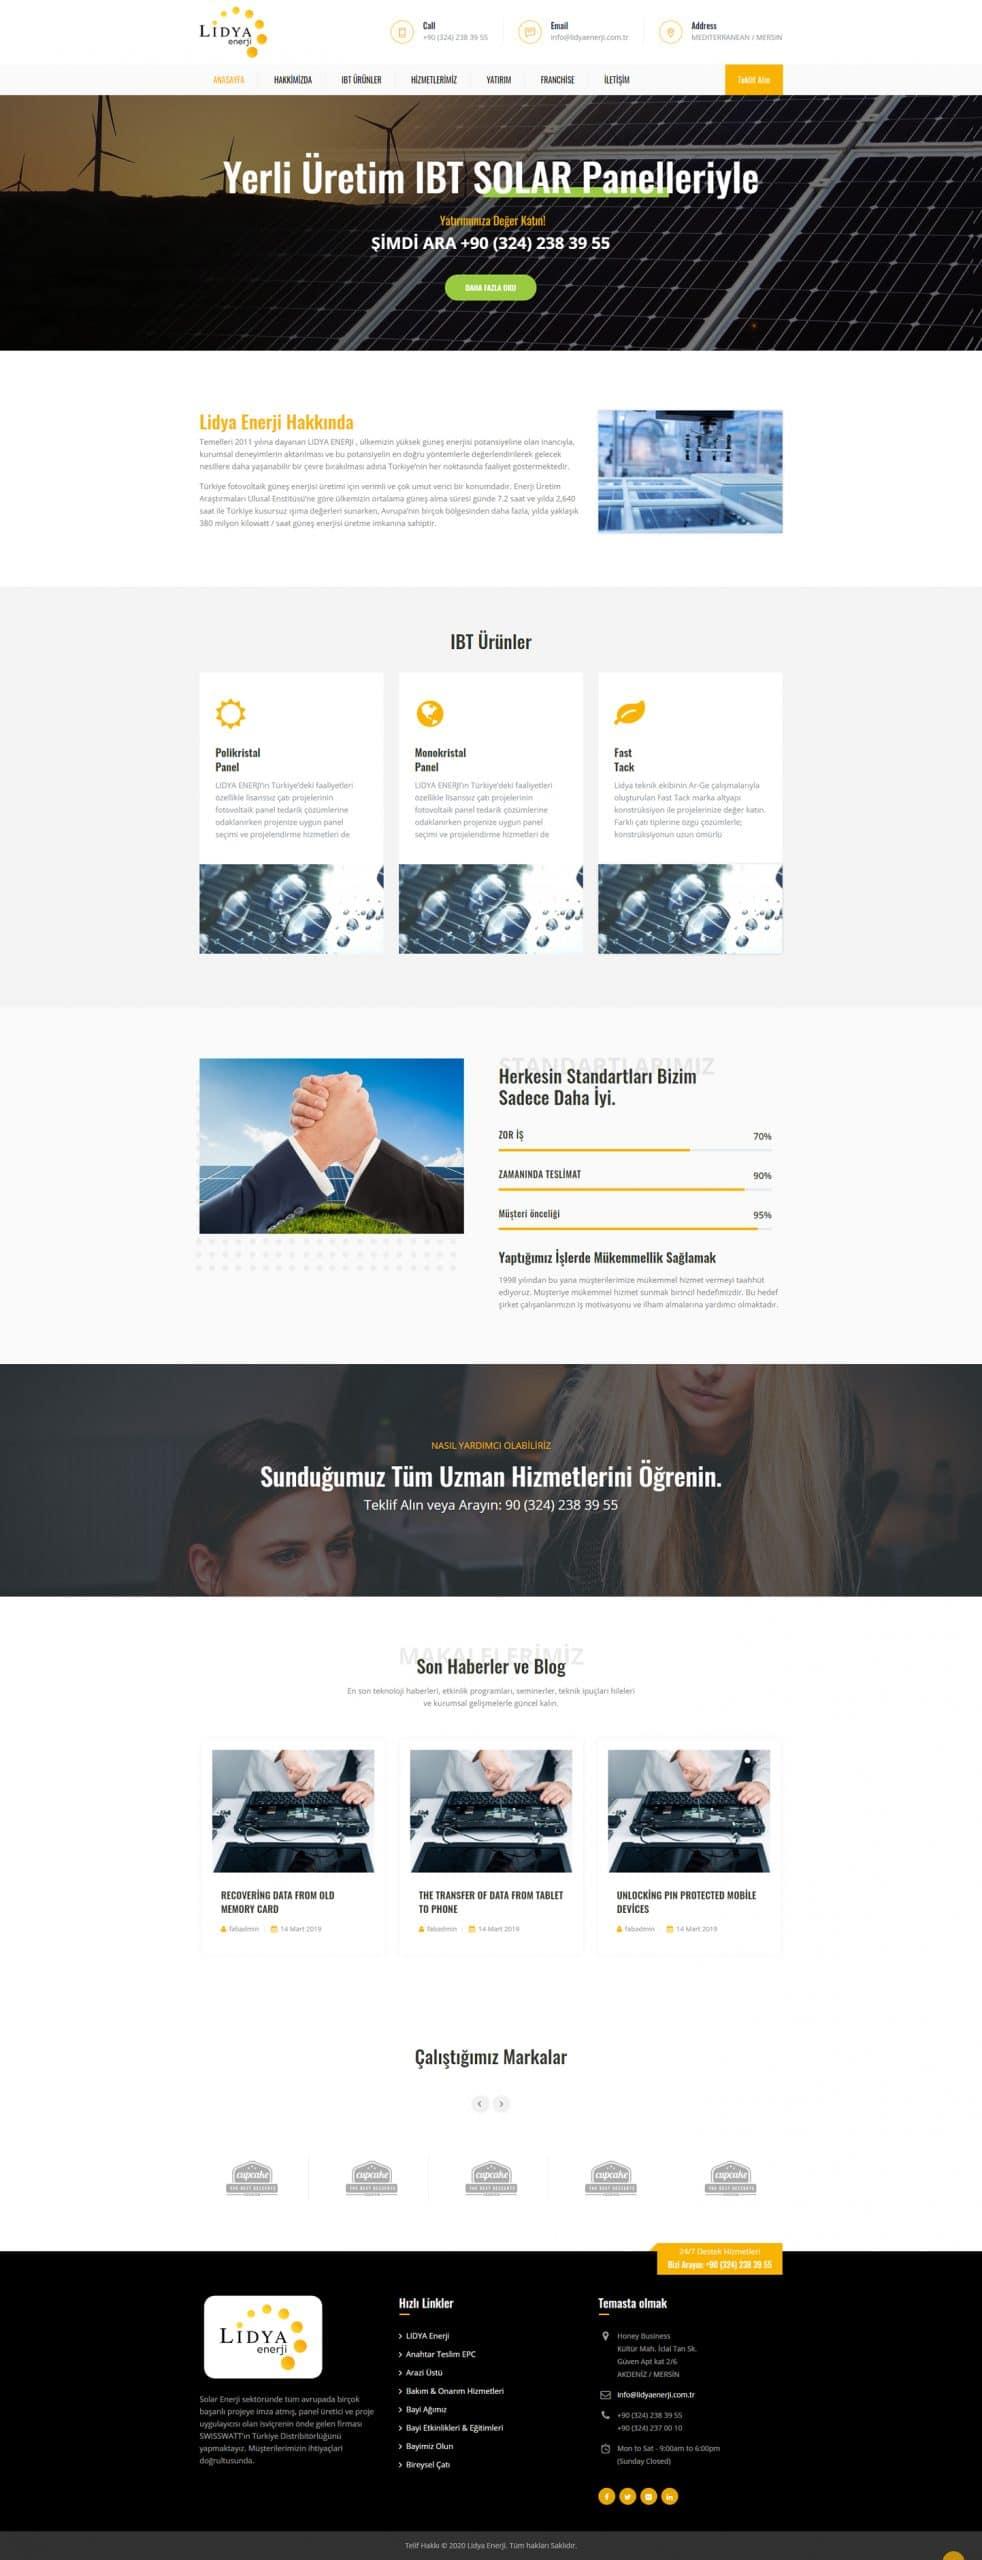 website-designing-in-turkish-language-scaled